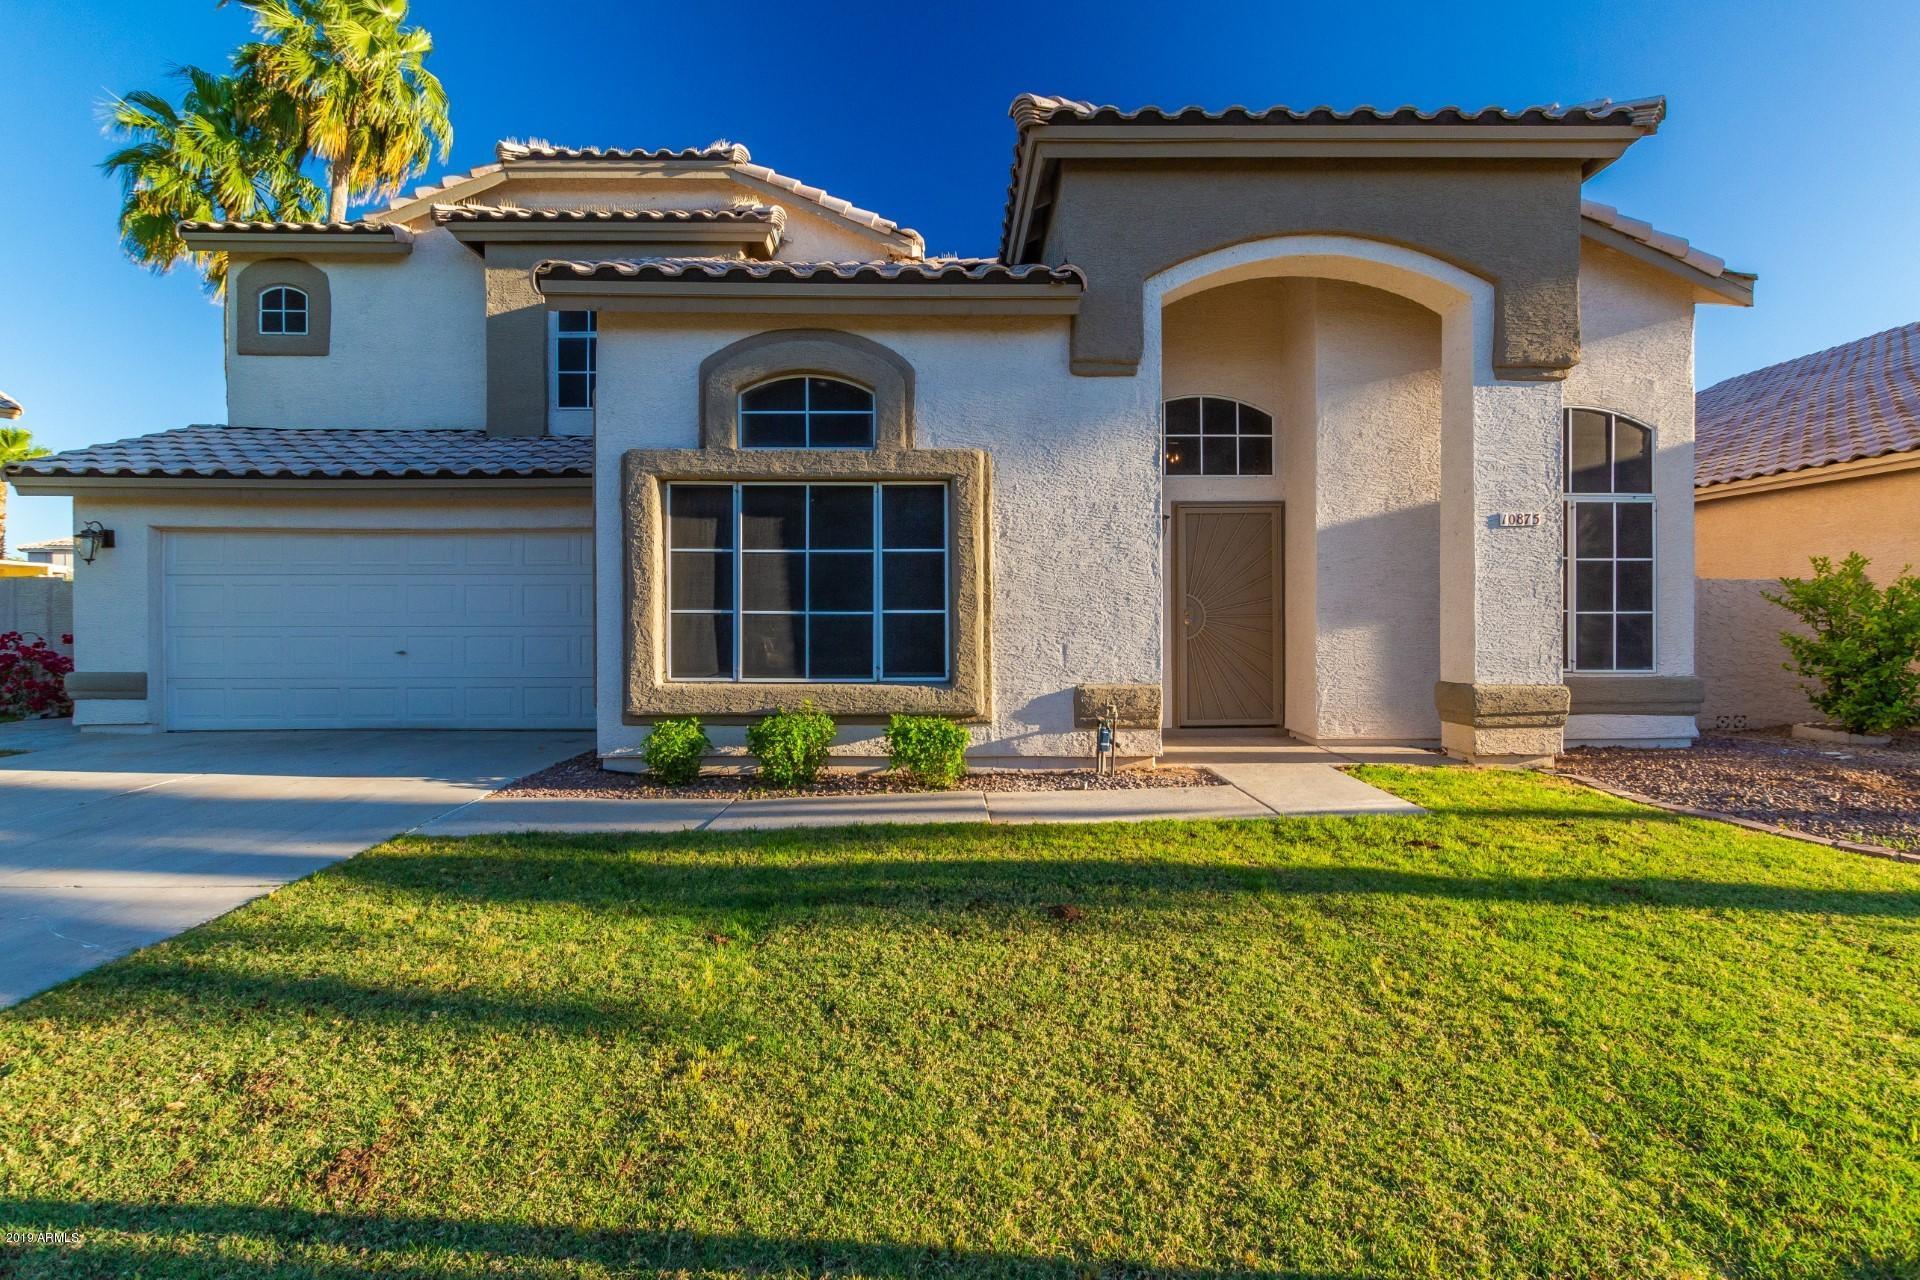 Photo of 10875 W LAURELWOOD Lane, Avondale, AZ 85392